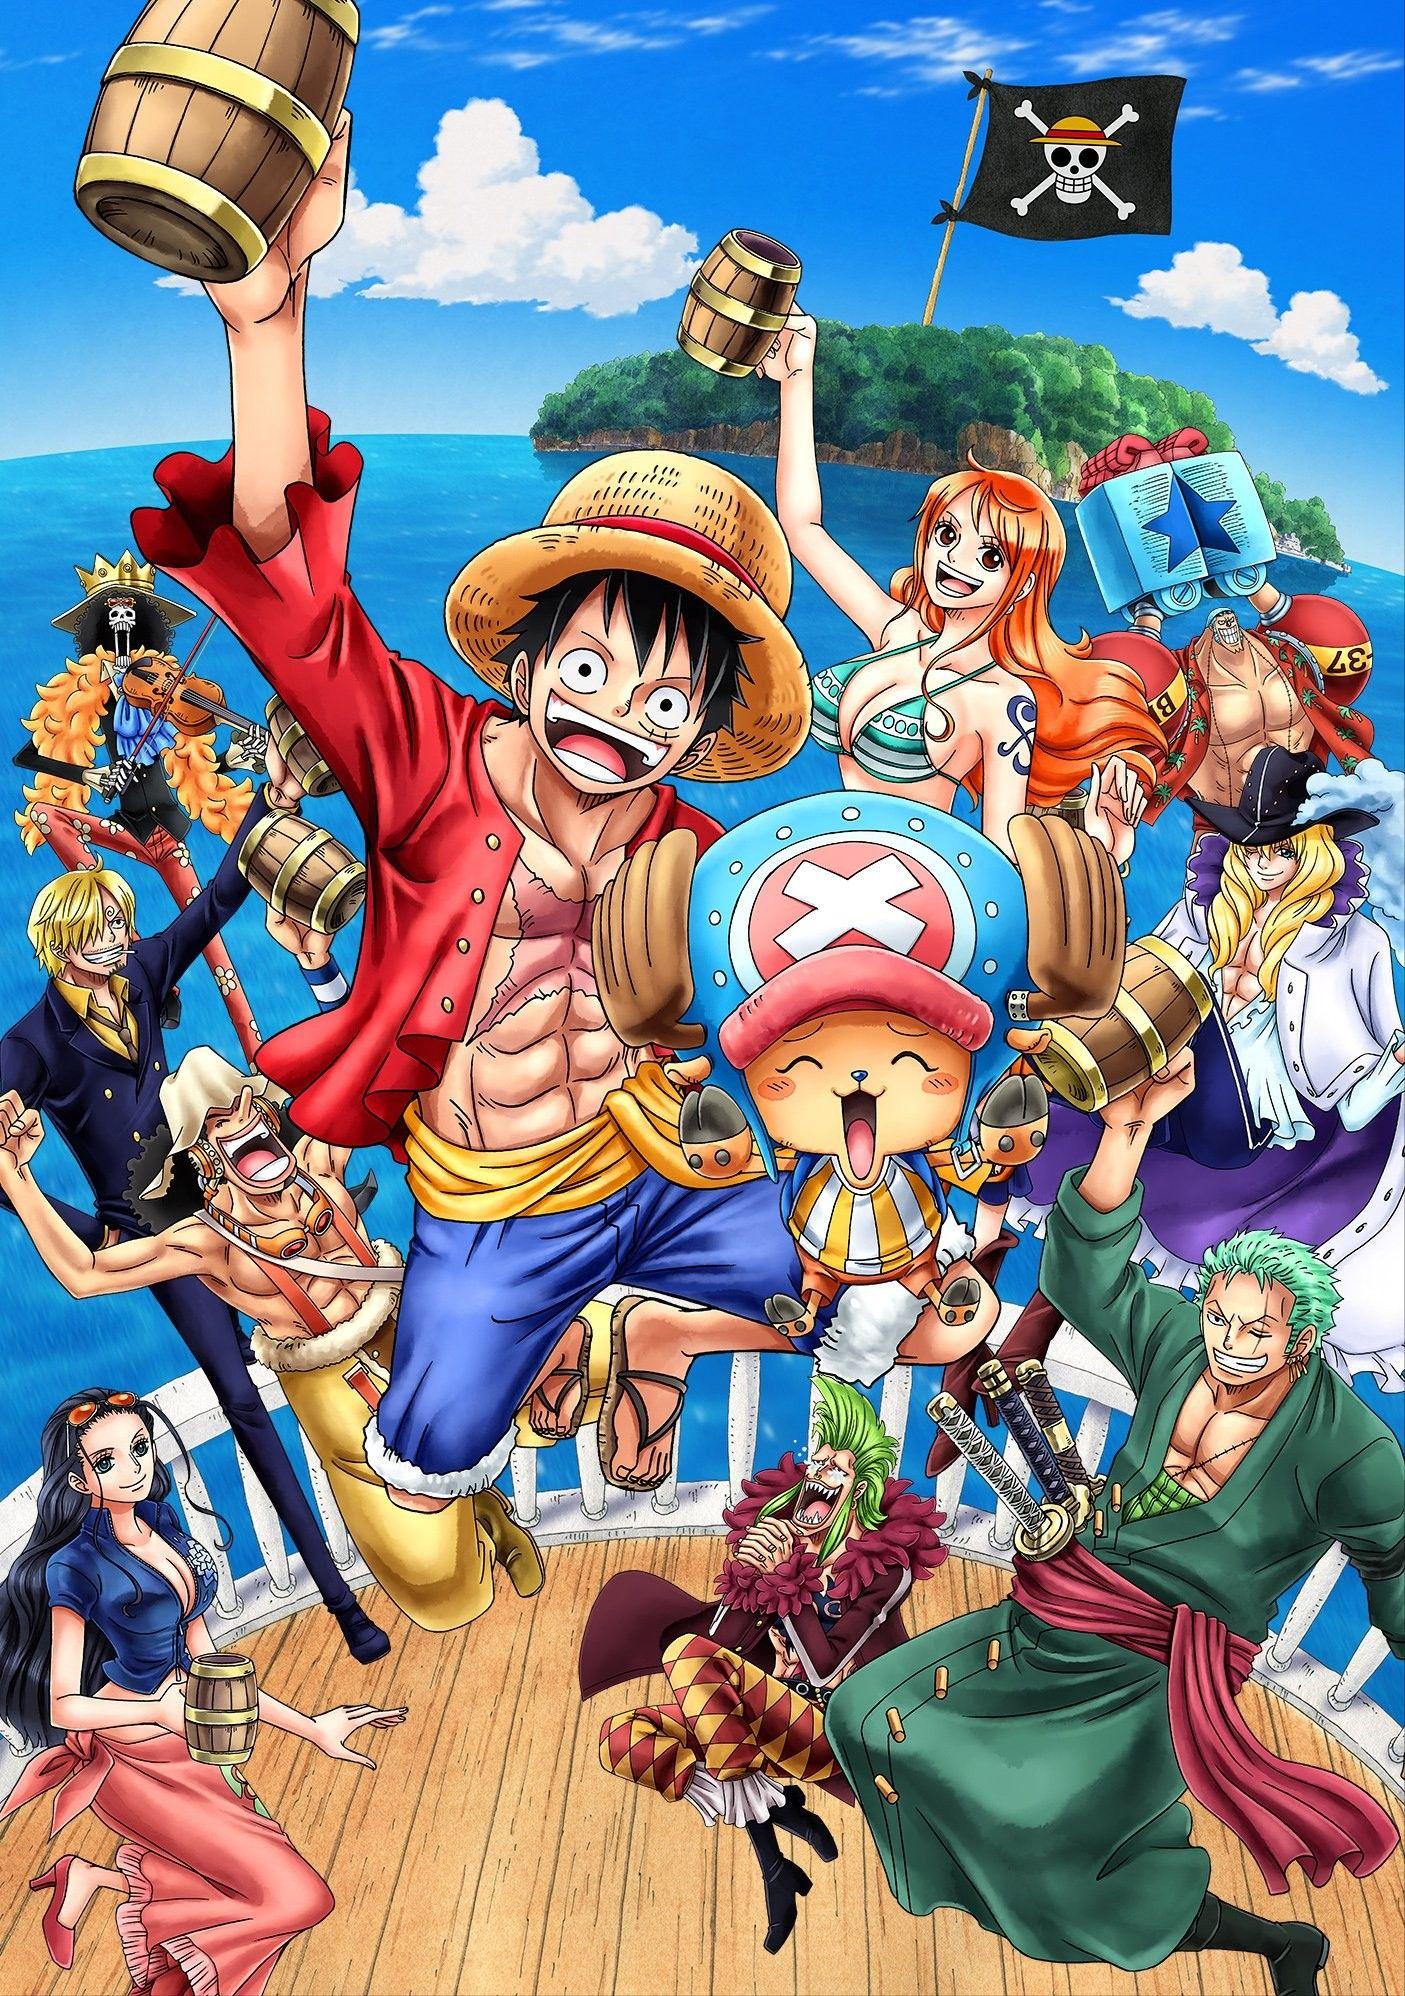 One Piece Chapéus de Palha Anime, Mangá wallpaper